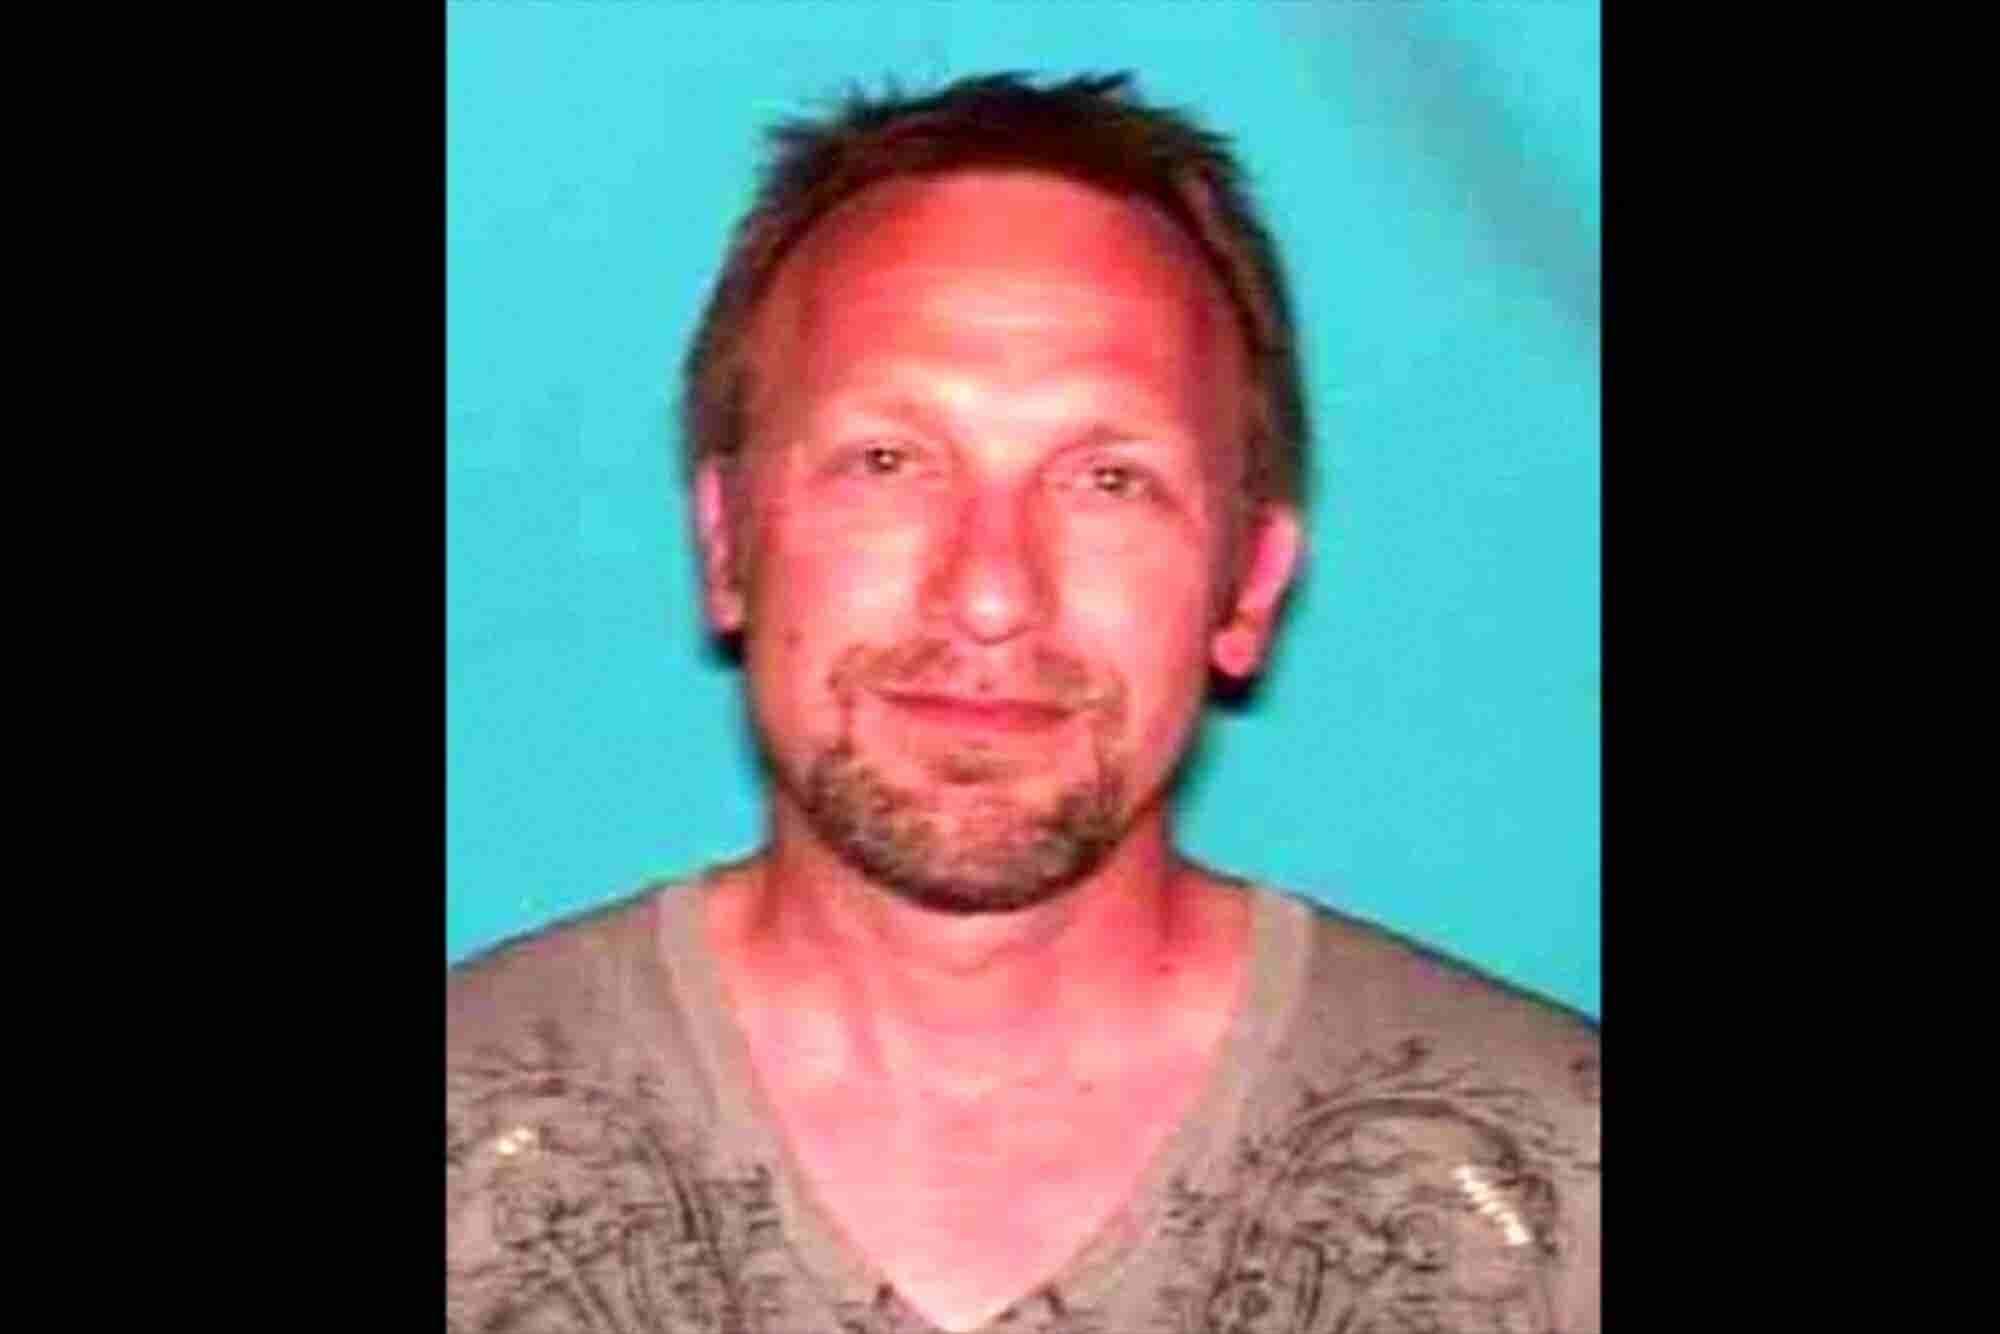 Backpage.com CEO Arrested Over Sex Trafficking Allegations